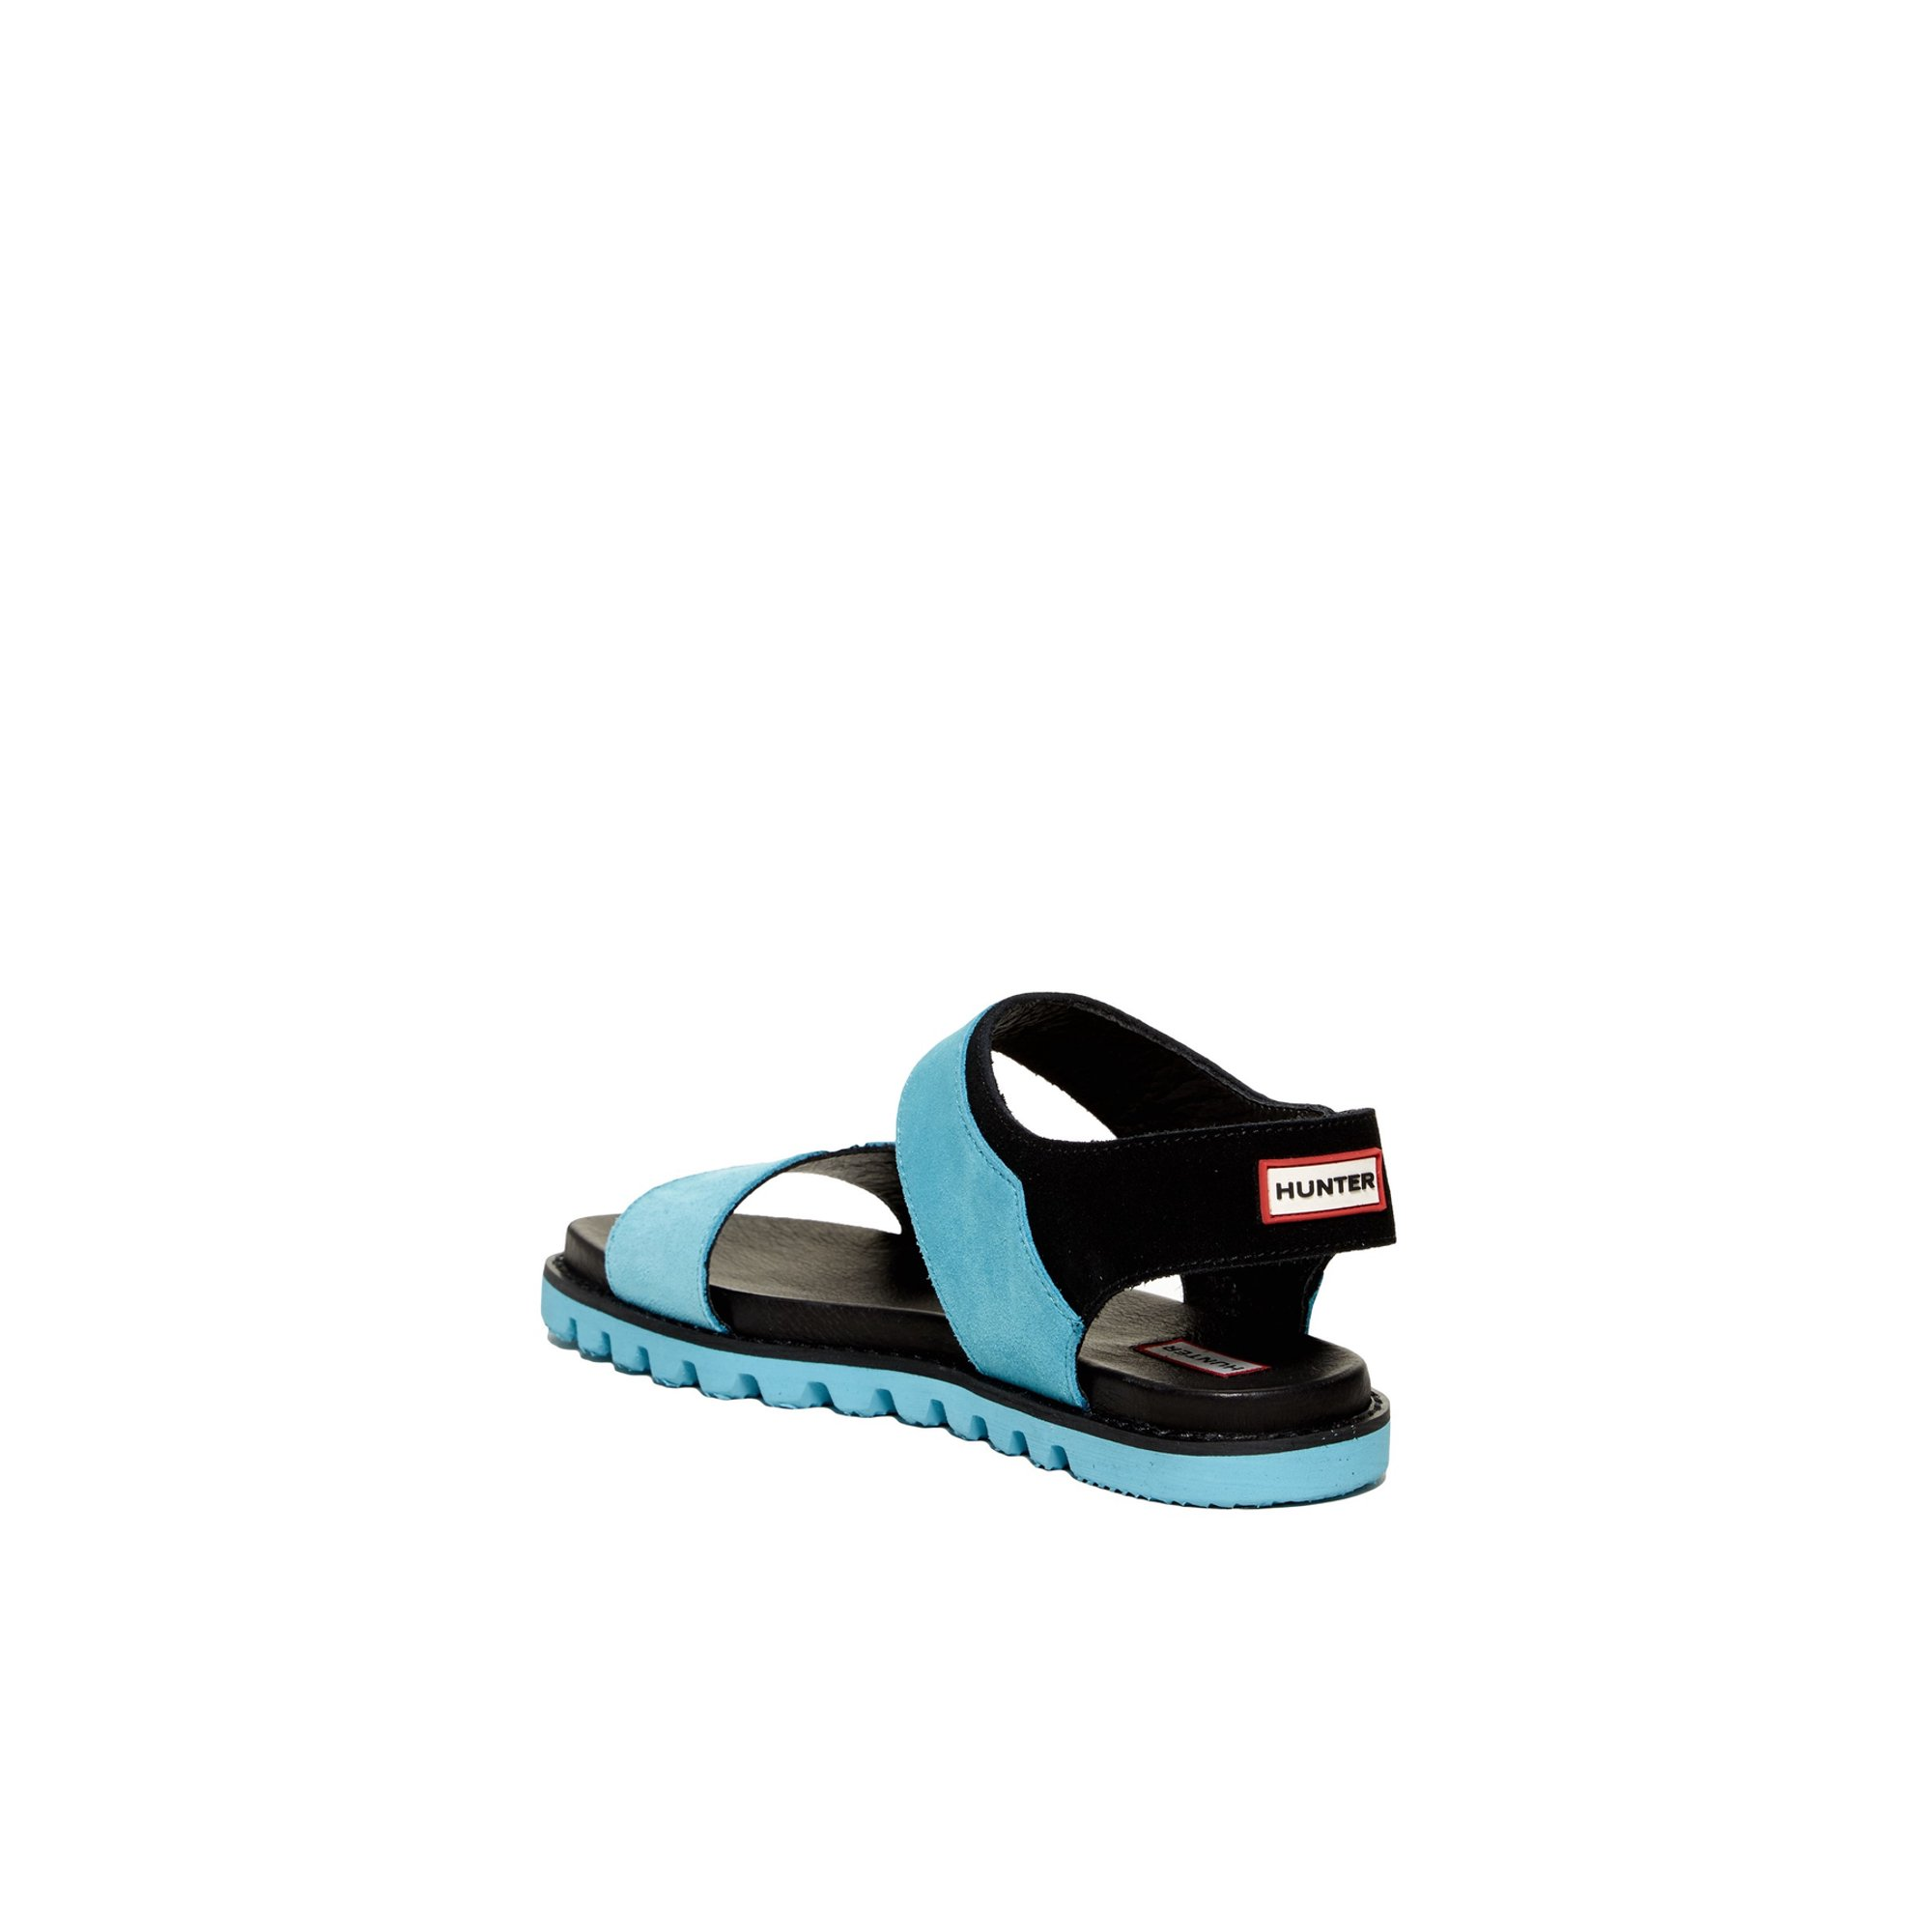 Leather Womens Sandal Sport Hunter Original Open Toe Casual 4A3qc5jSRL